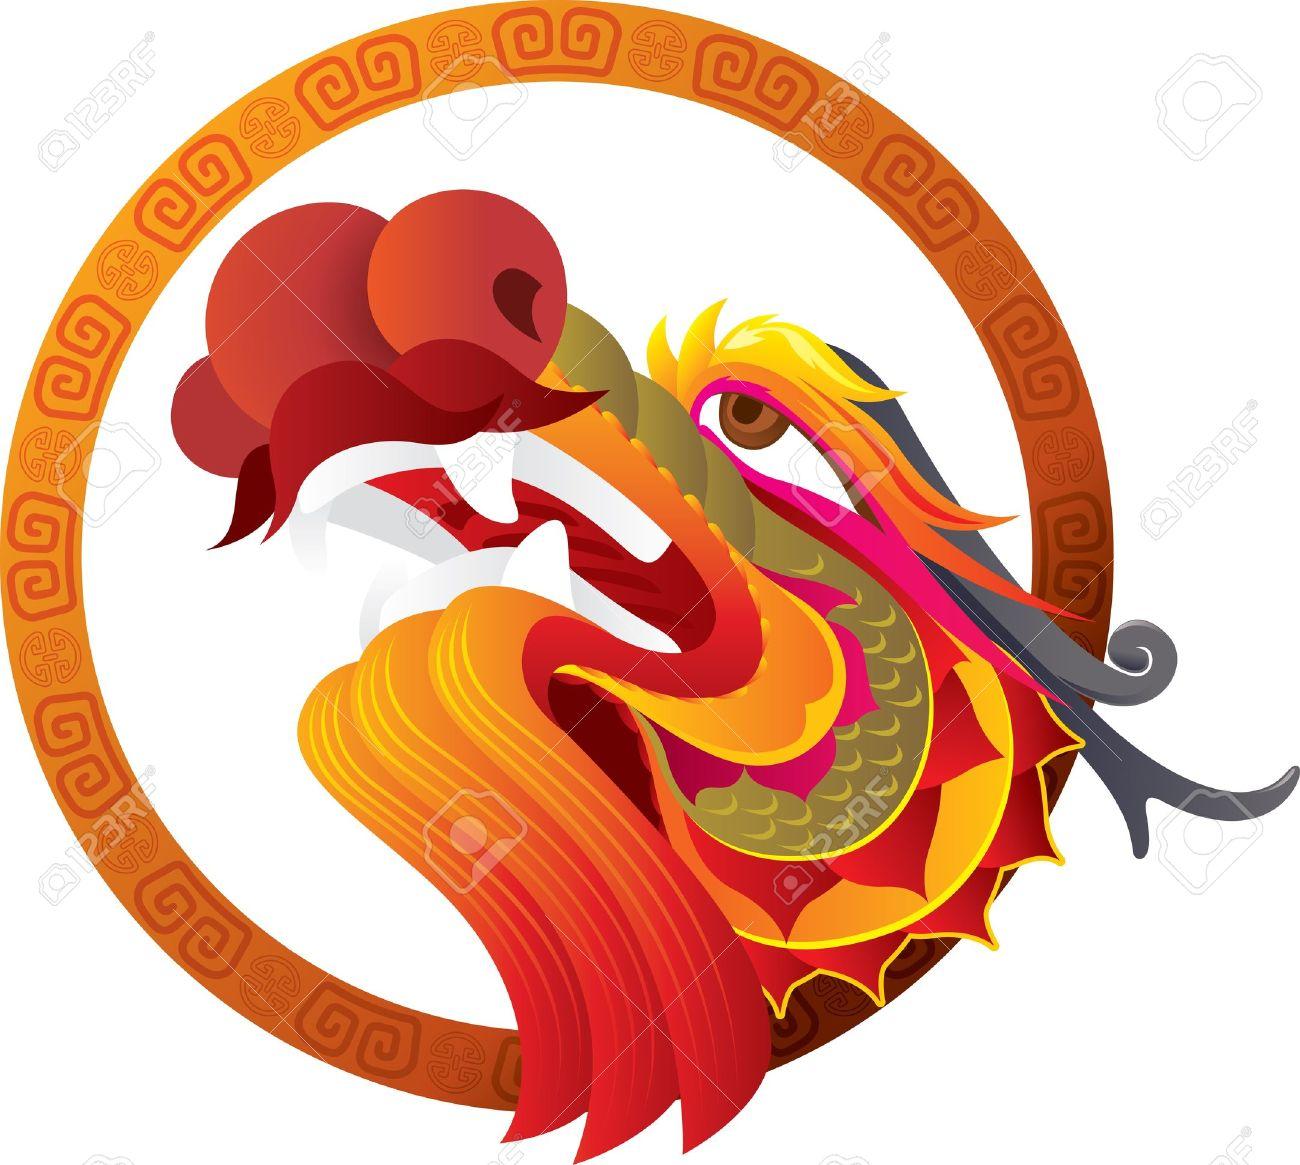 Chinese Dragon Head with border art design illustration Stock Vector - 18622210